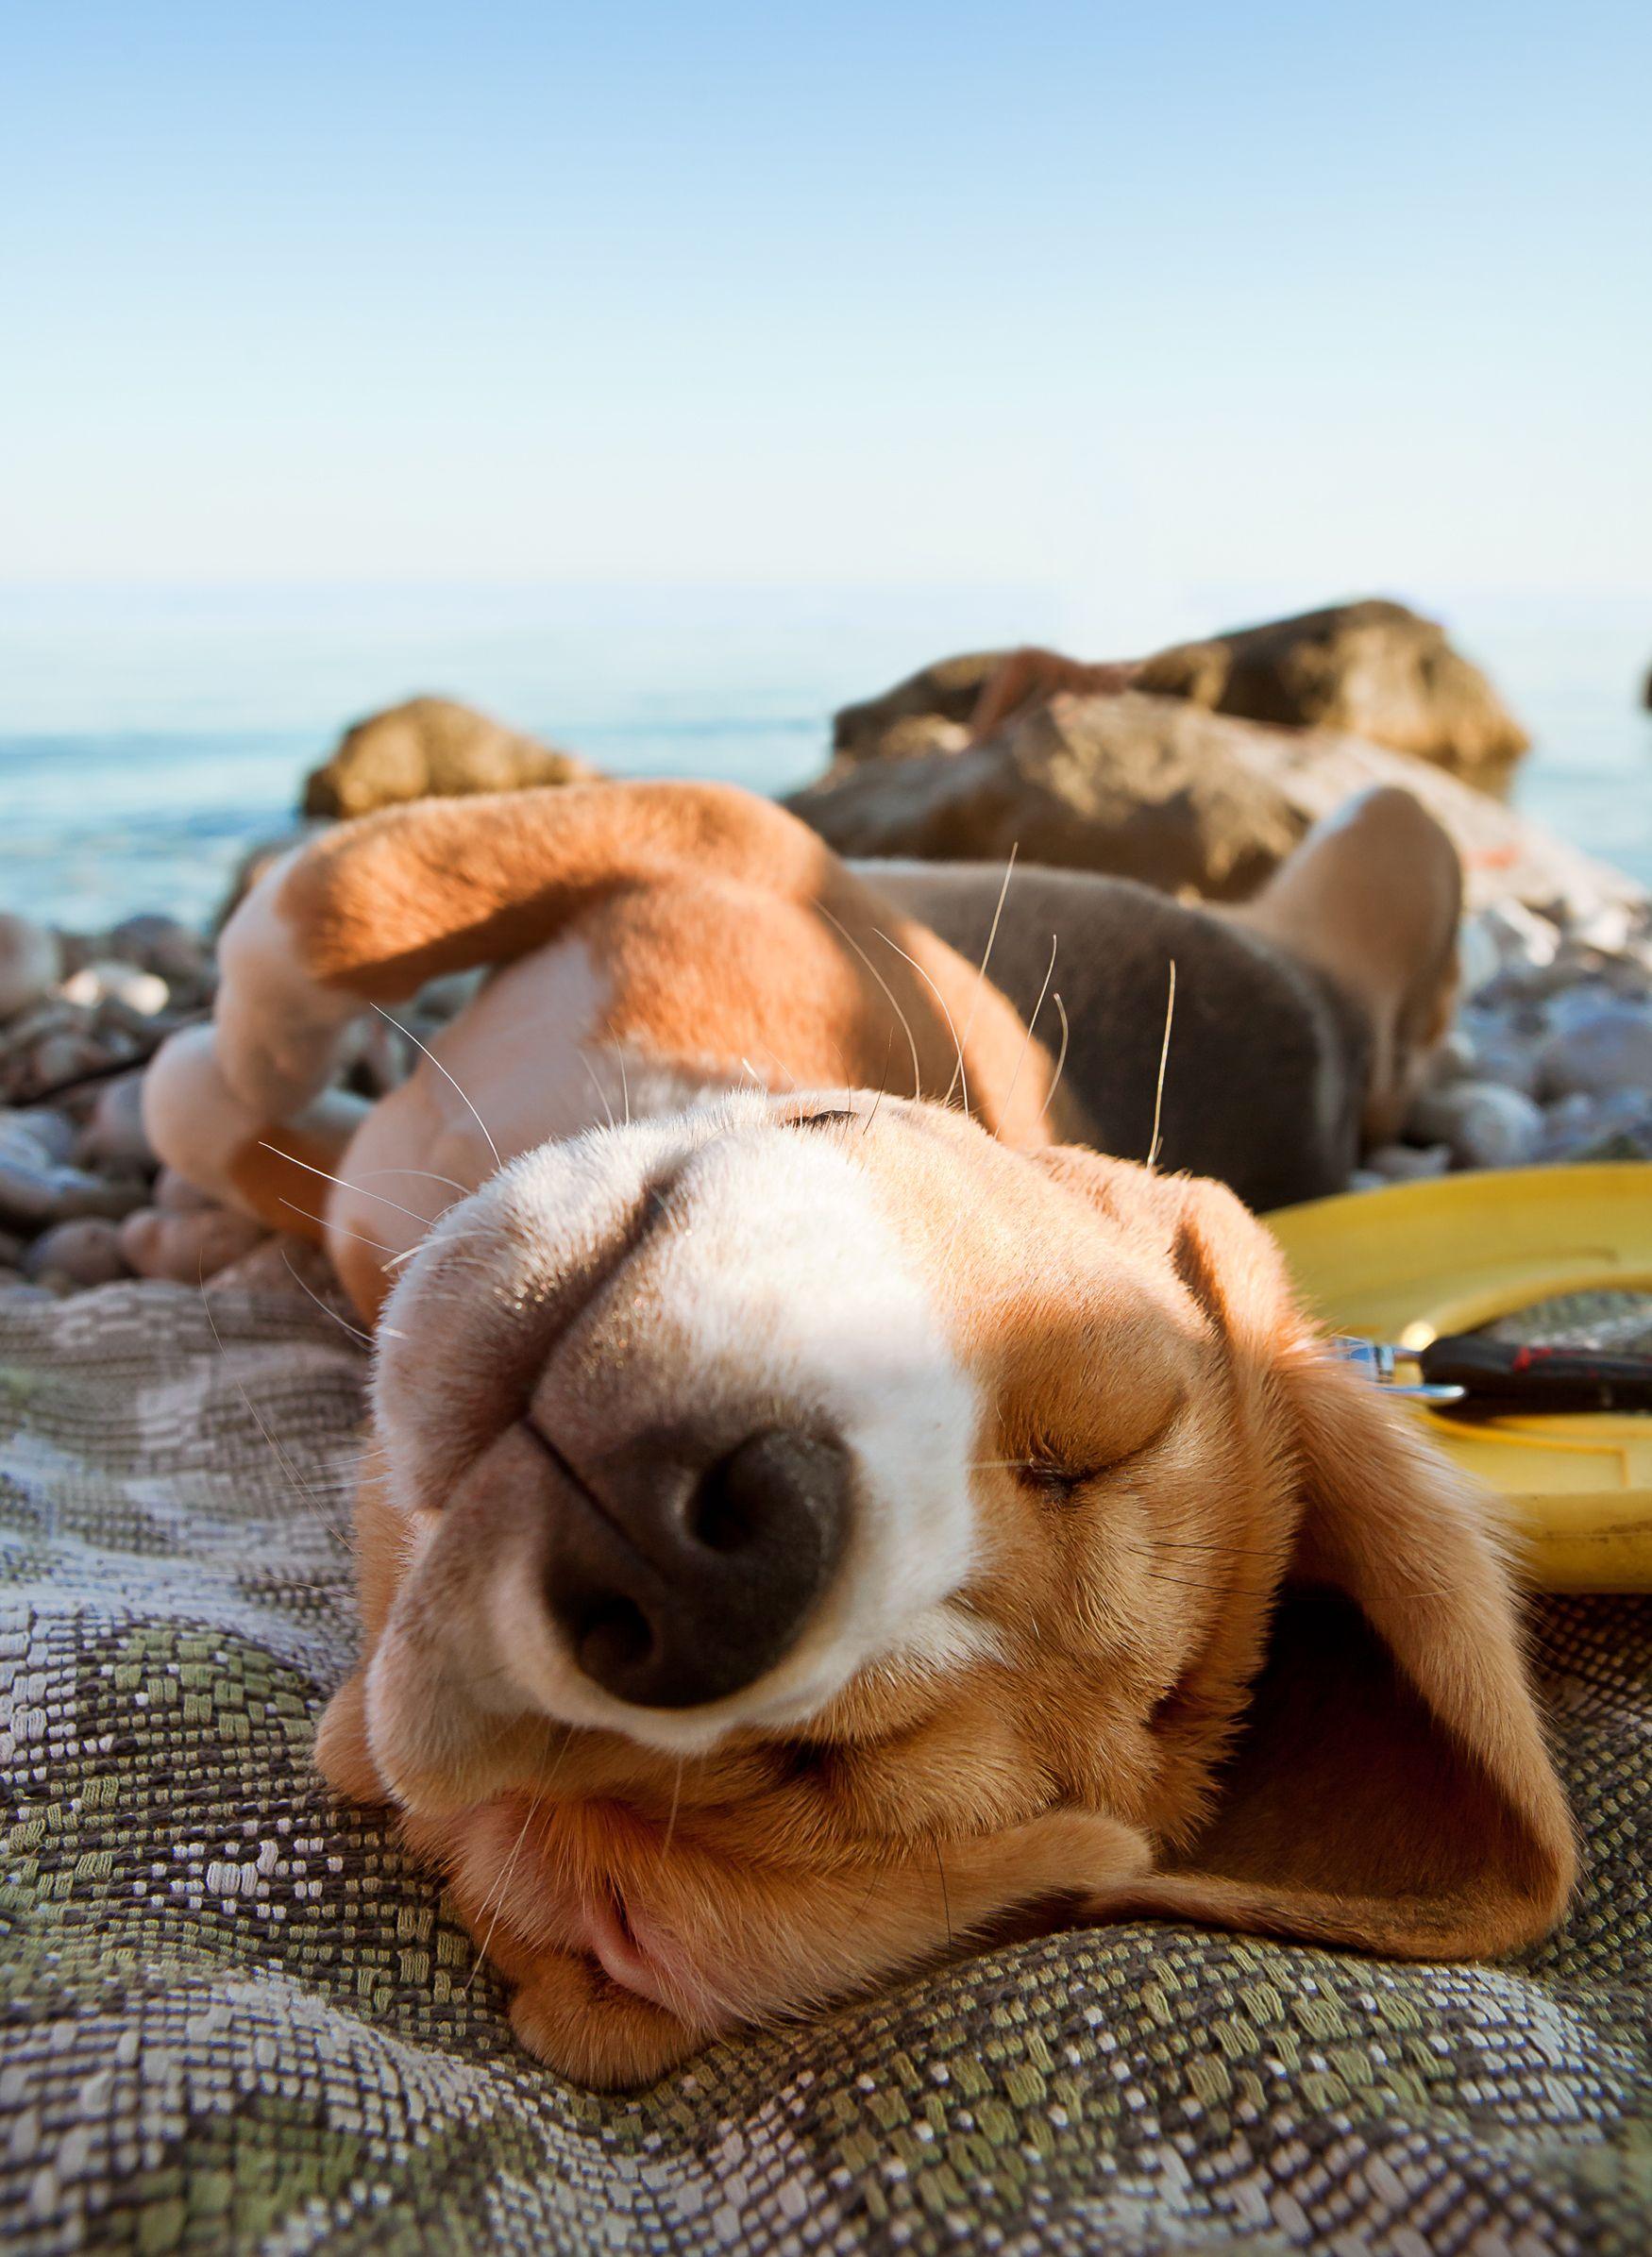 Www Pamperedpetstravel Com Dog Dogs Puppy Puppies Pet Pets Travel Trip Traveling Pettravel Cute Chiot Corgi Photo Animaux Toutous